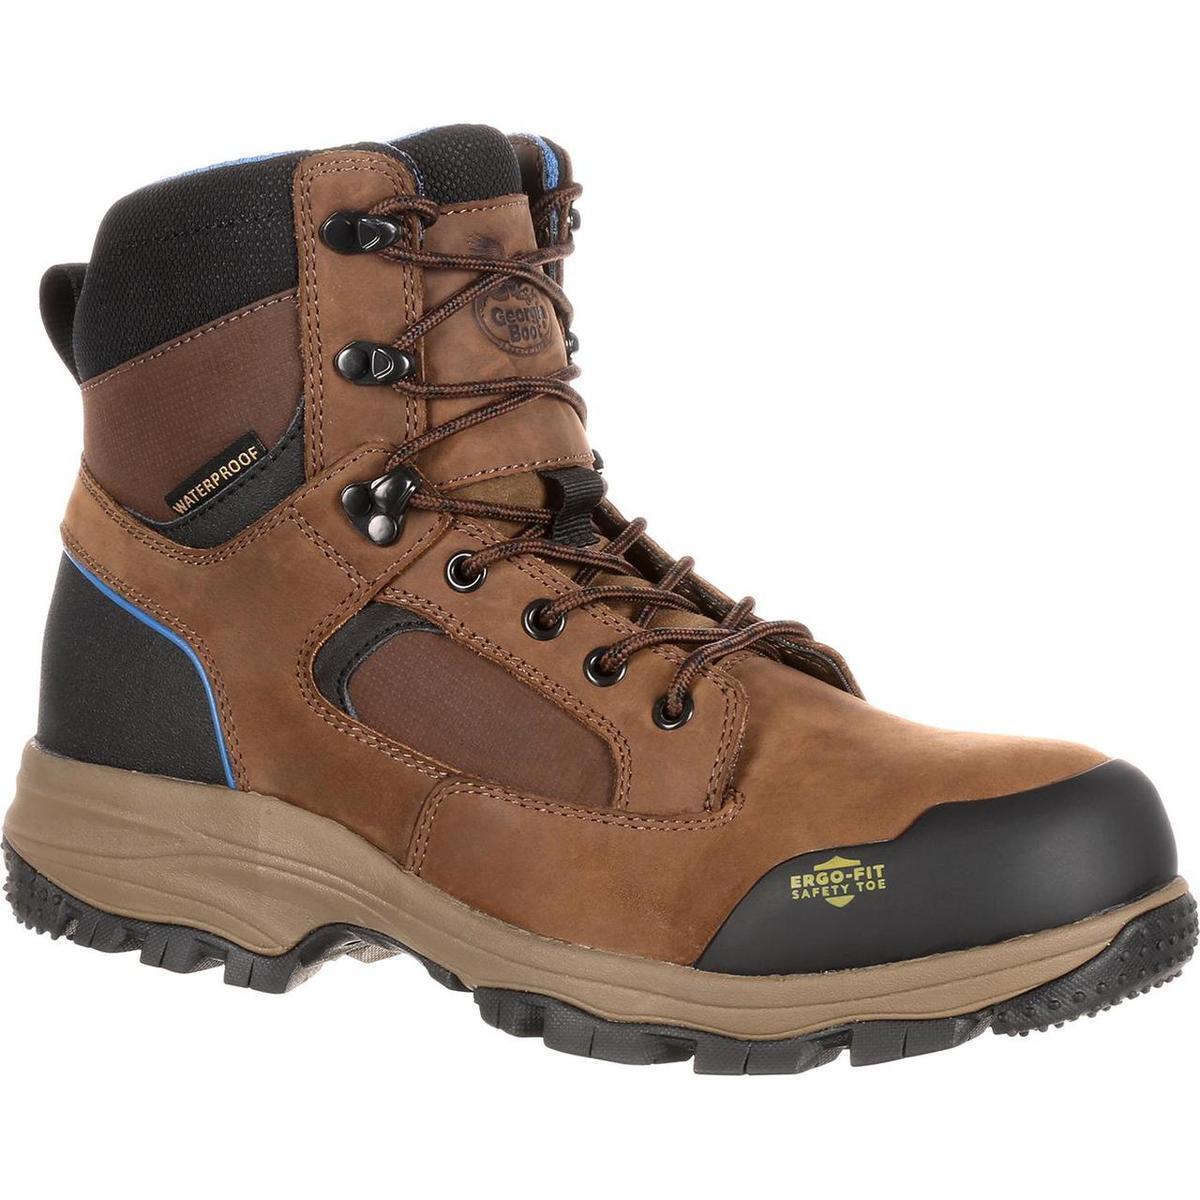 Georgia Boots GB00107 bluee Collar Waterproof Work Hiker Dark Brown Boots